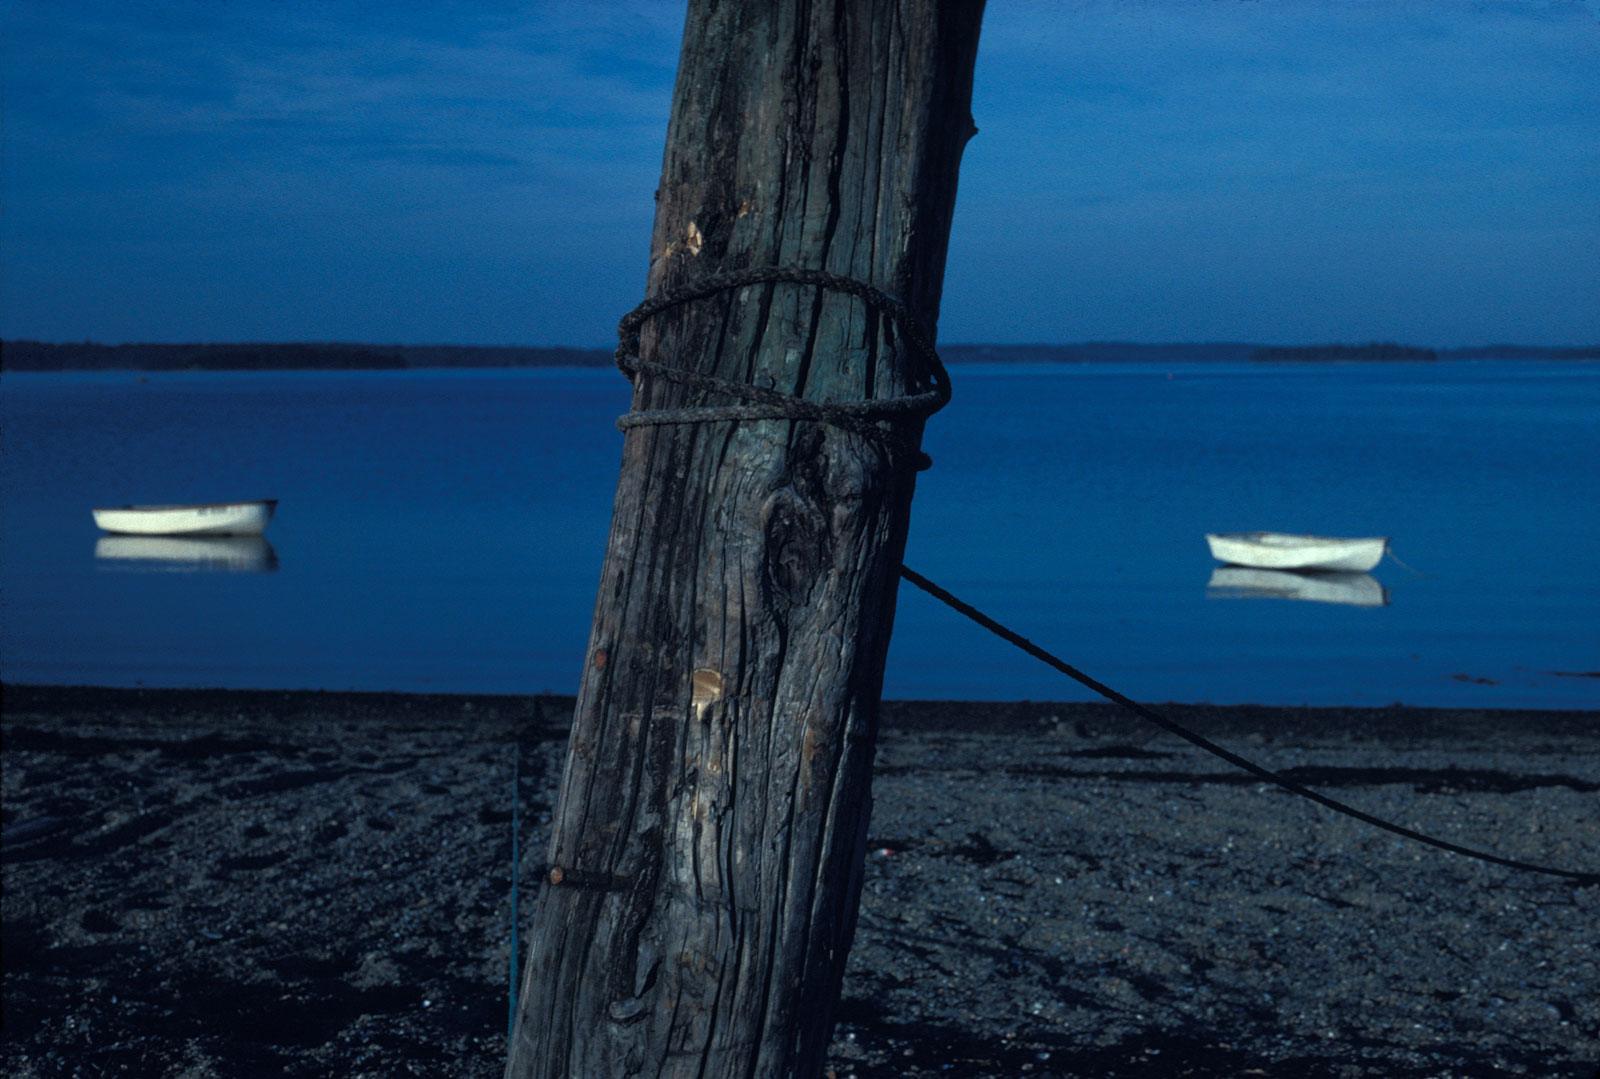 Blue Evening, by Joel Mason.